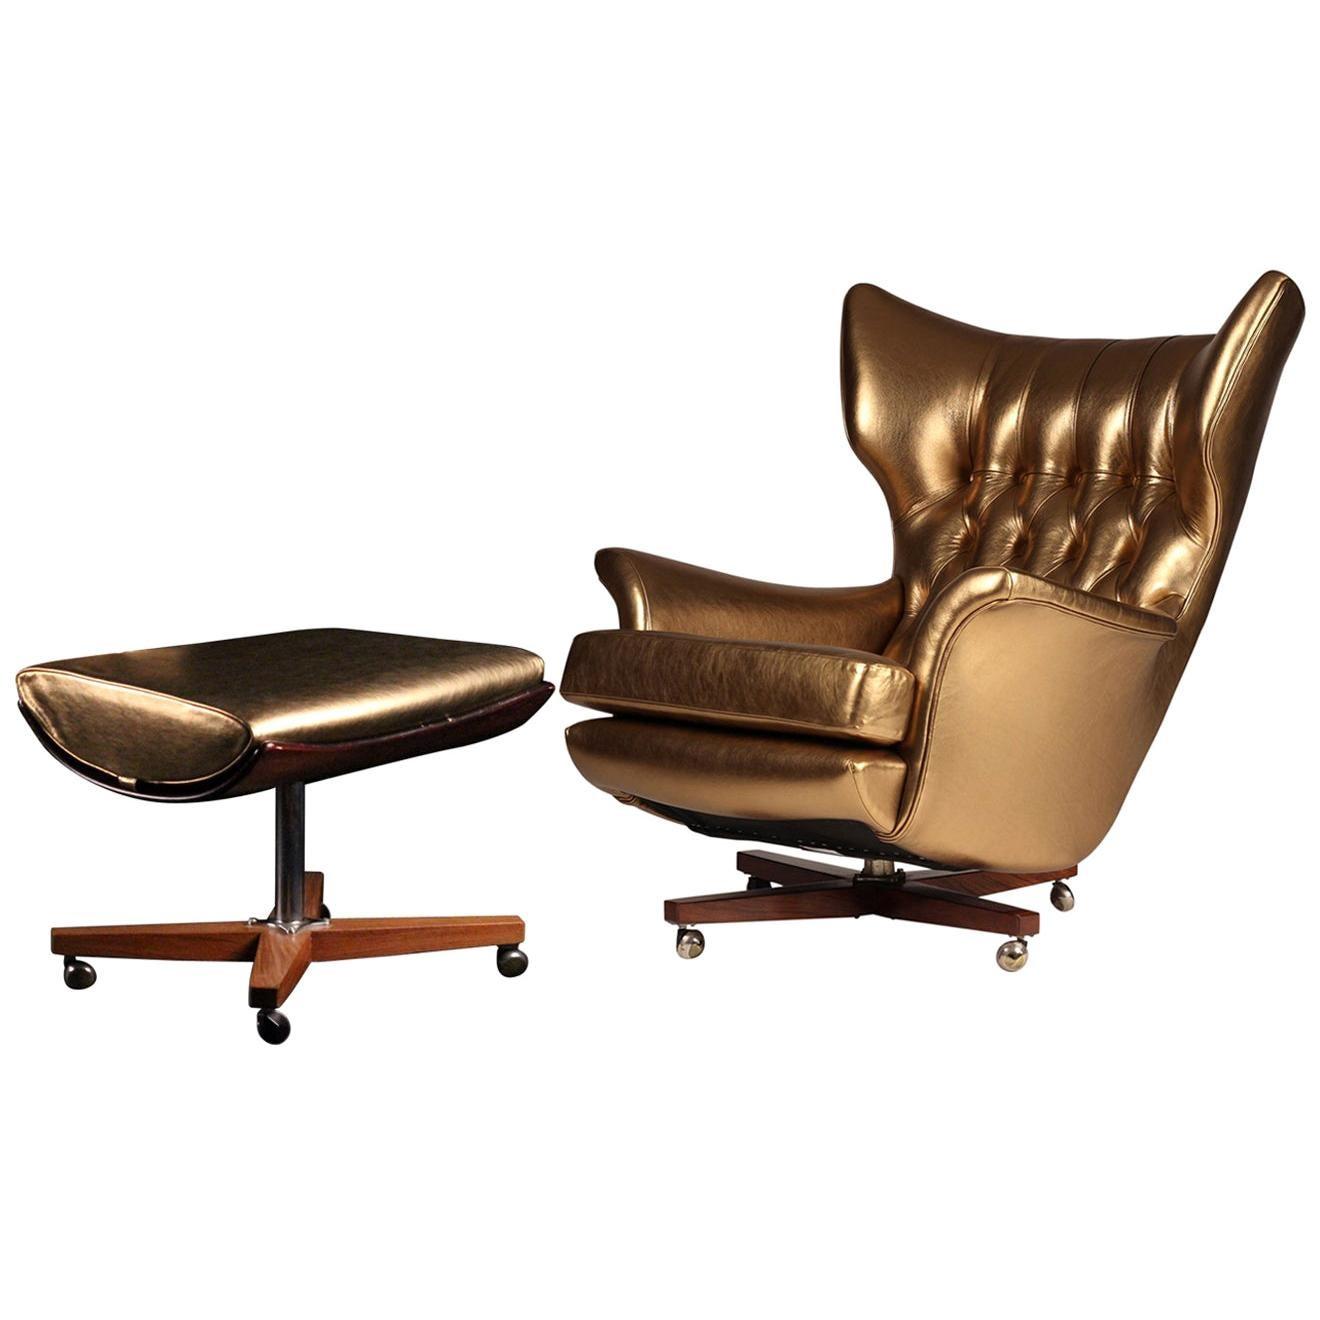 G Plan Lounge Chair and Ottoman Model 62 'Blofeld'